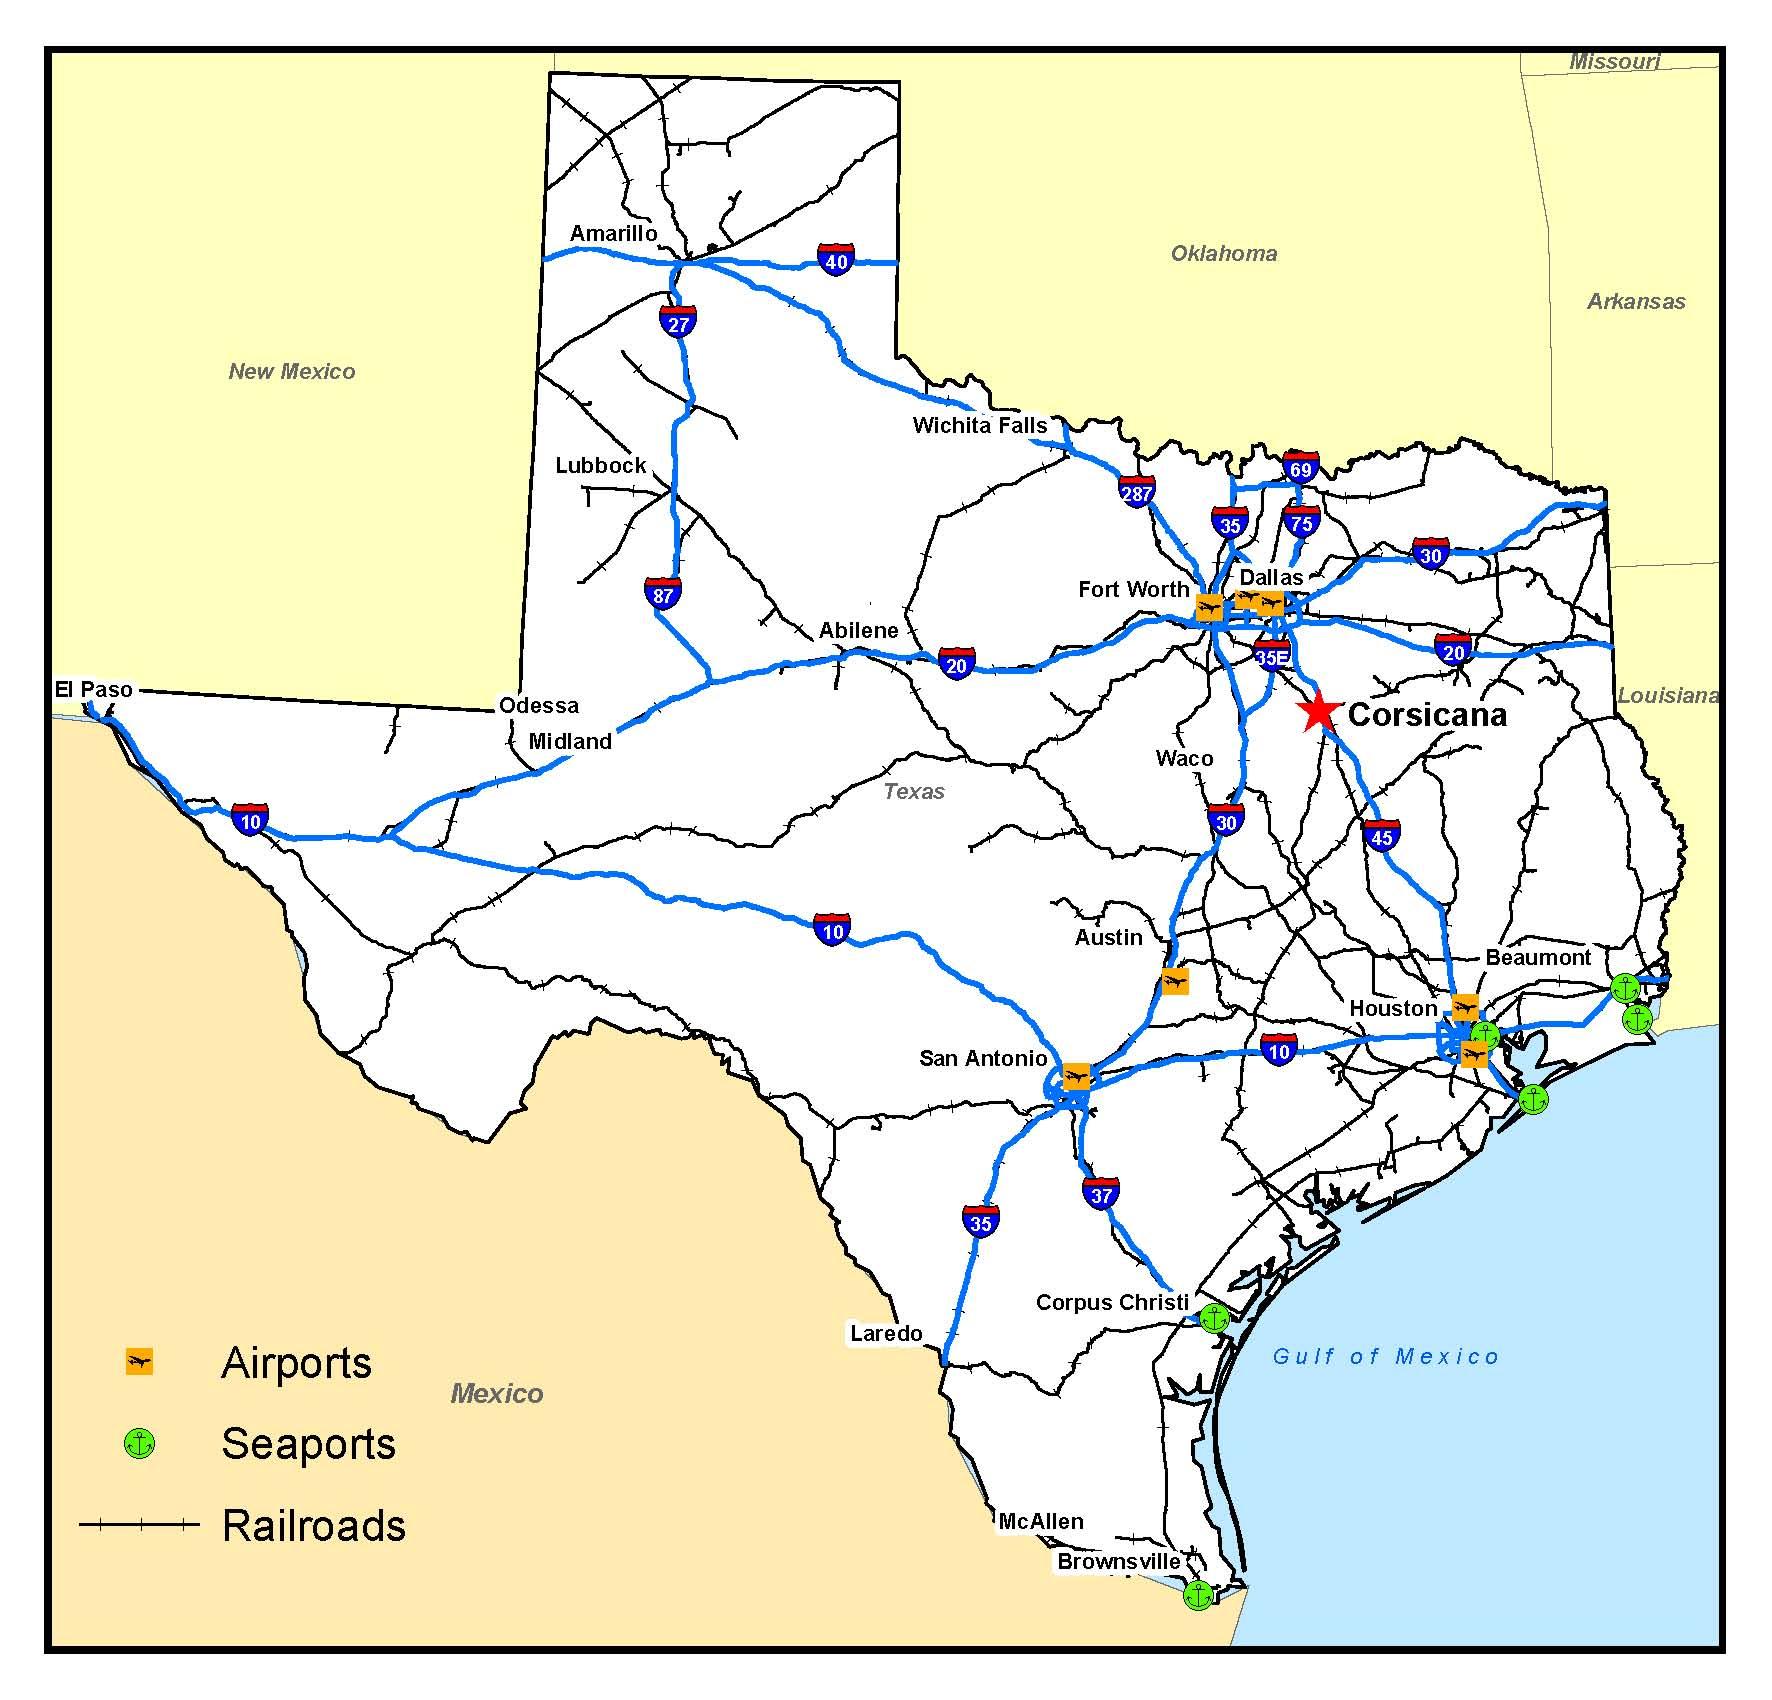 Corsicana Tx Us Map Interactive Hail Maps Hail Map For Corsicana Tx - Hail Maps Texas